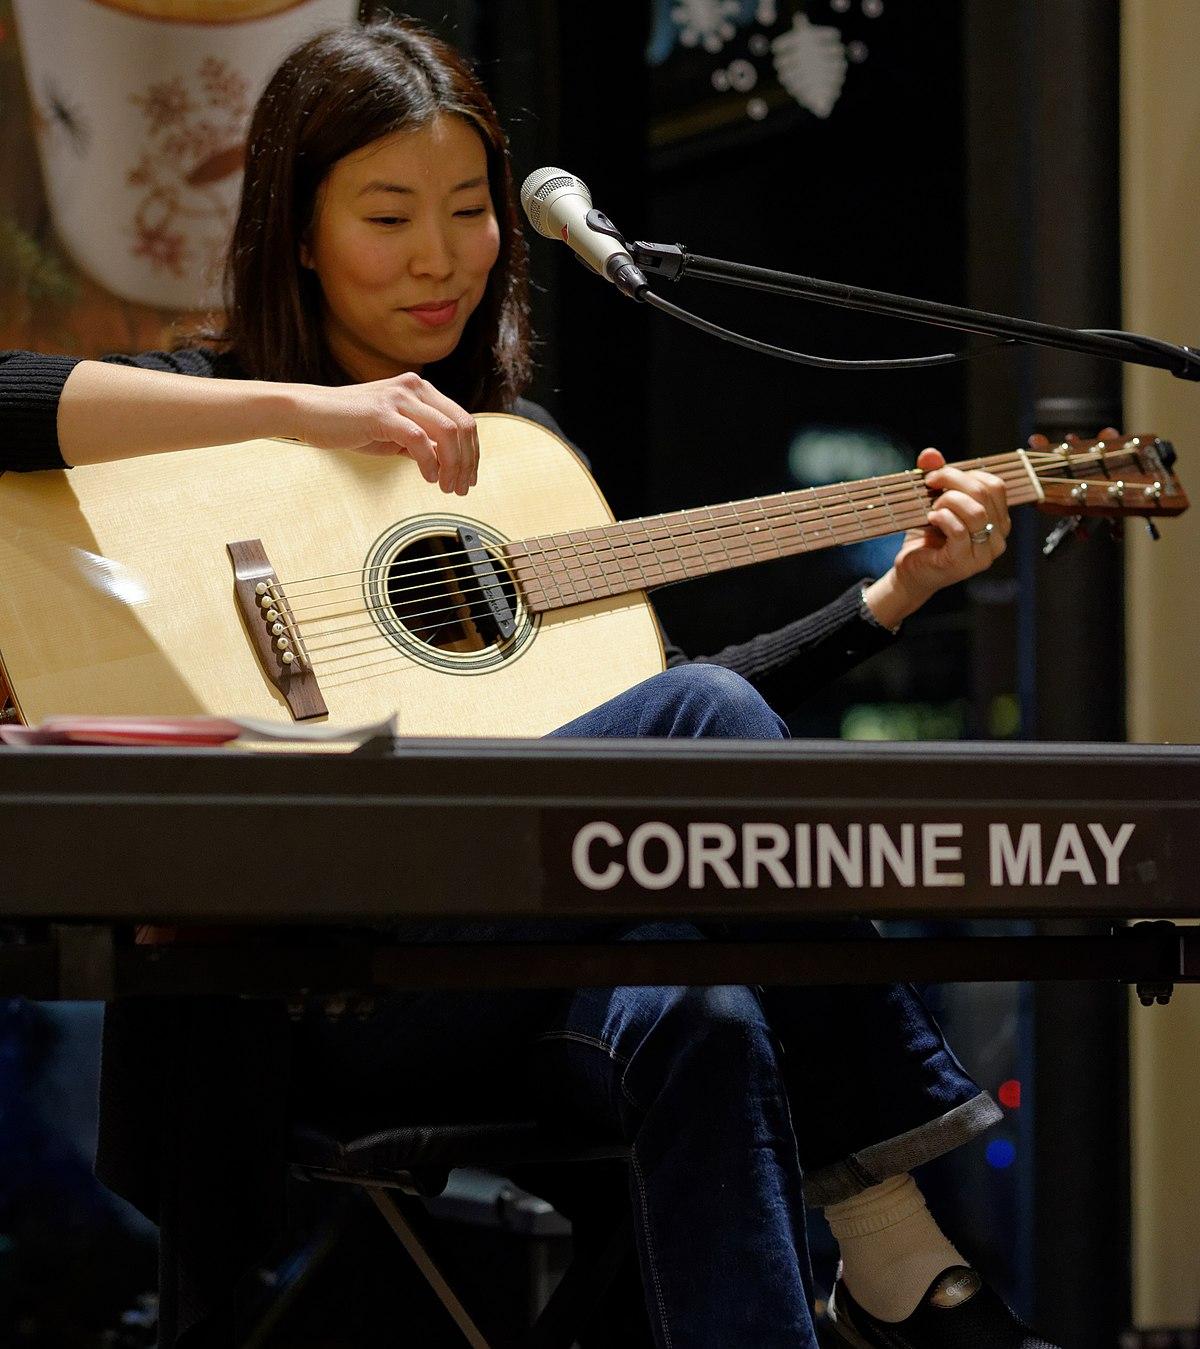 Corrinne May - Wikipedia